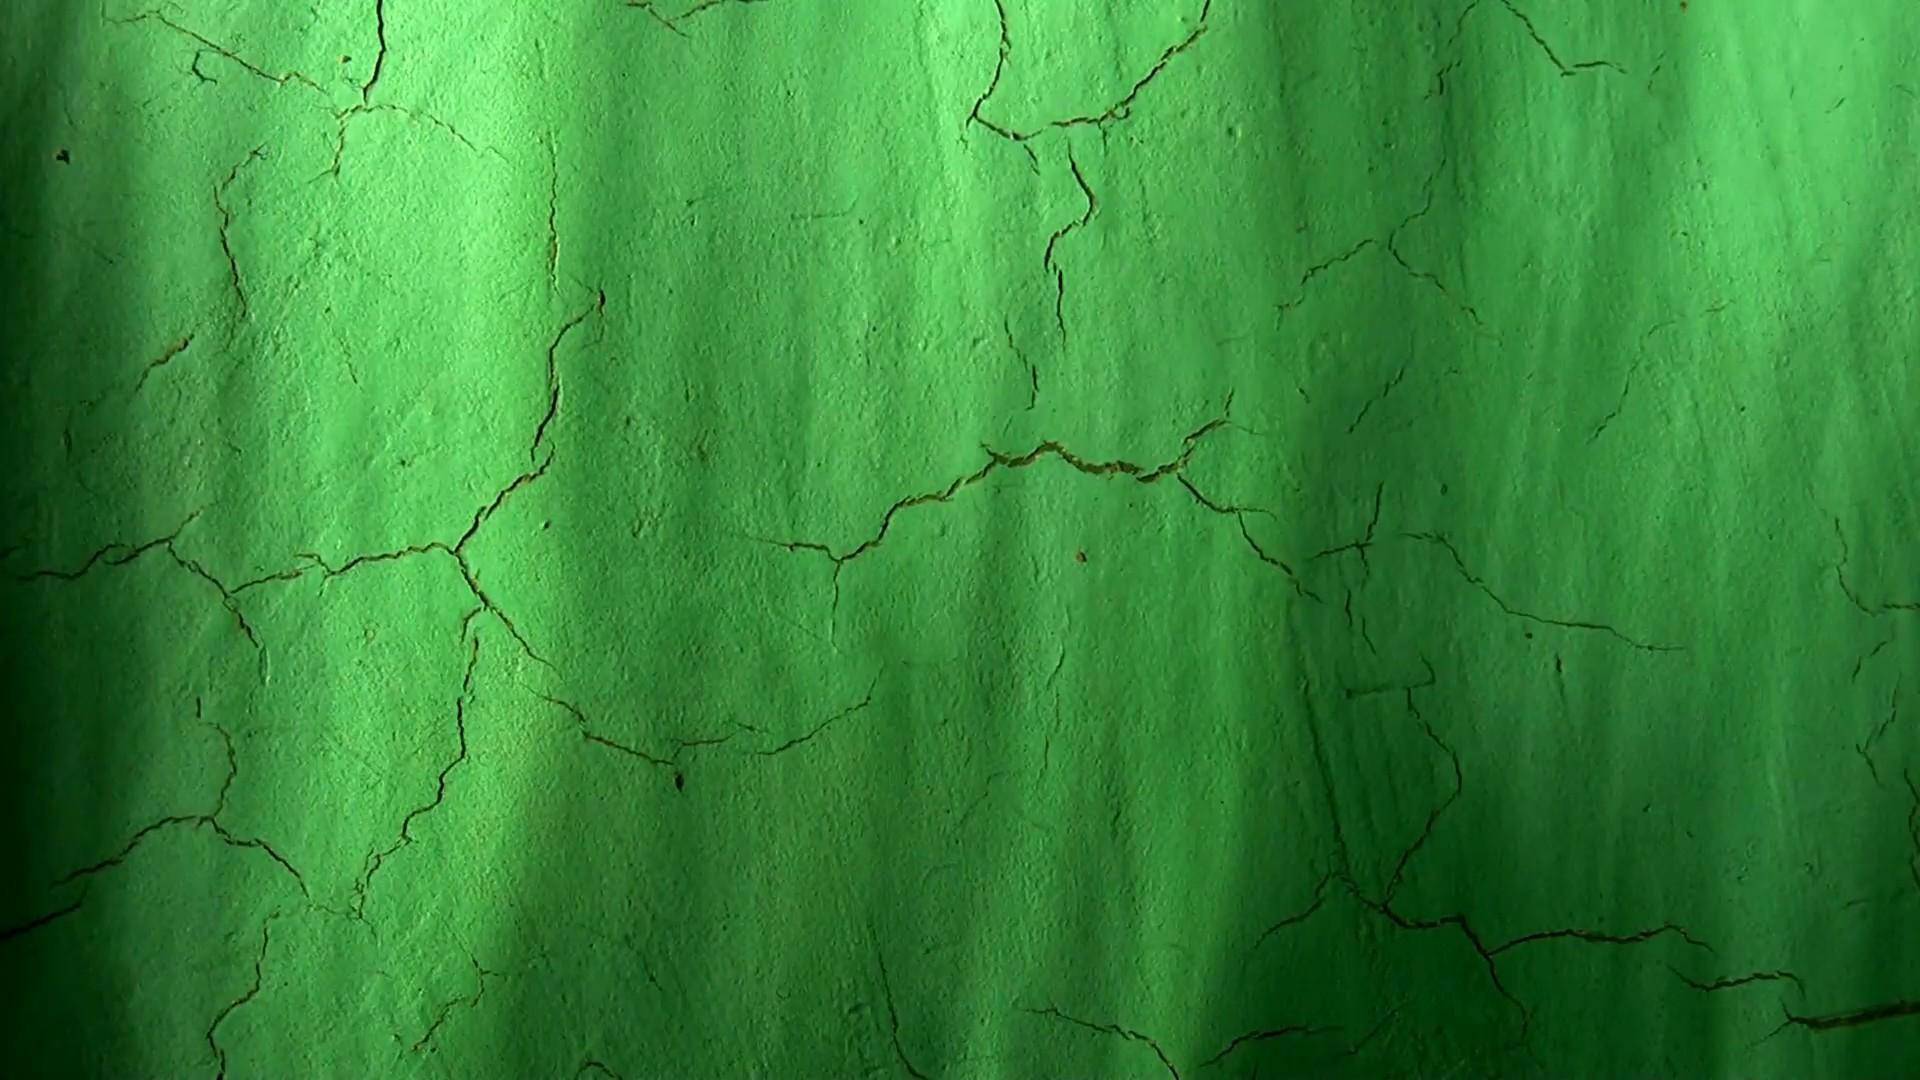 Old Wood Wallpaper Hd Green Grunge Background 183 ① Download Free Stunning High